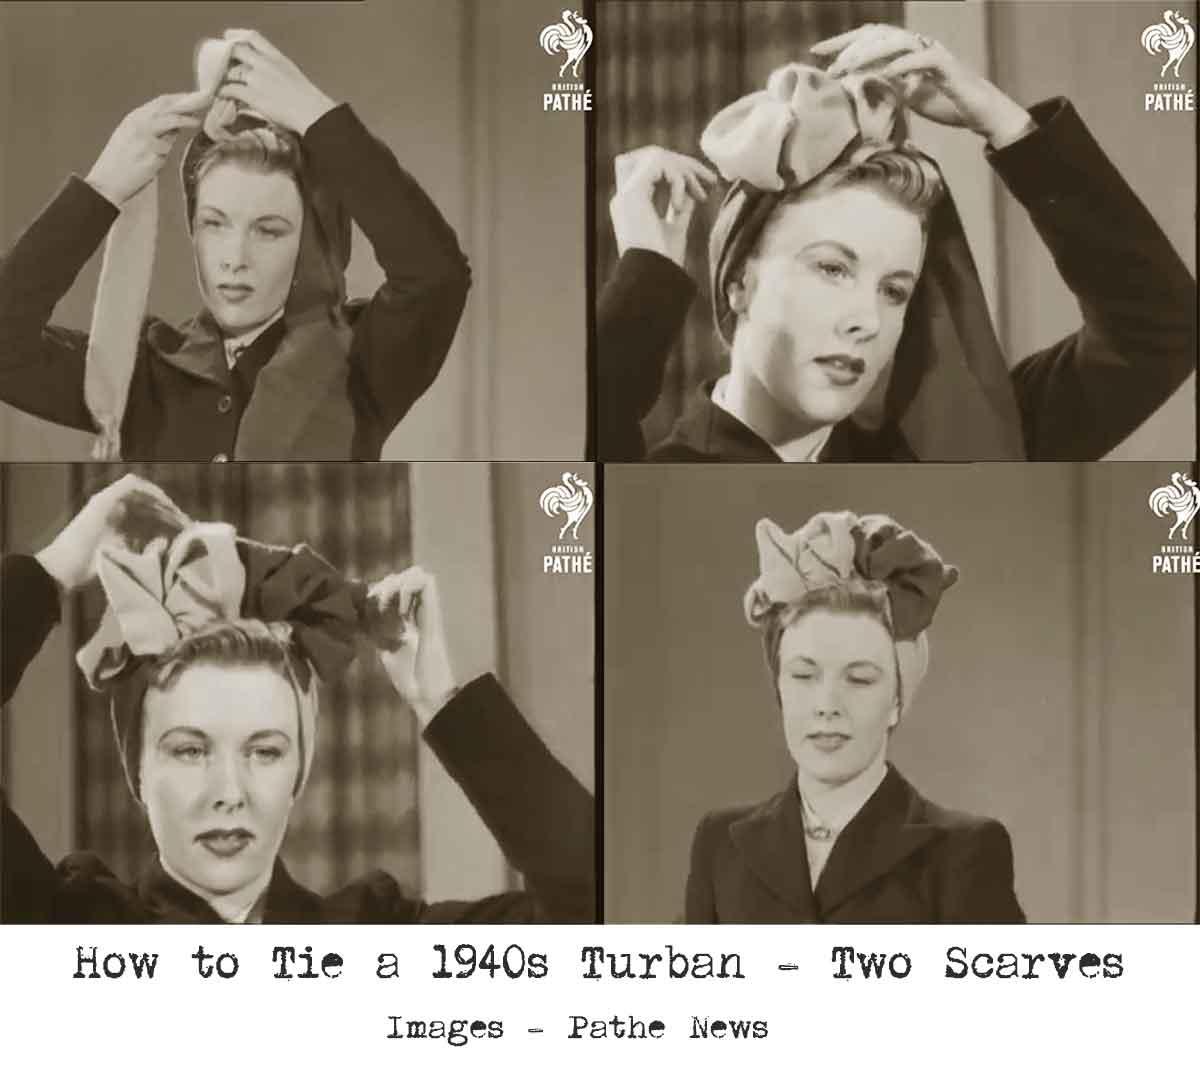 1940s Fashion - How to make a Glamorous Turban  93de6d7329f